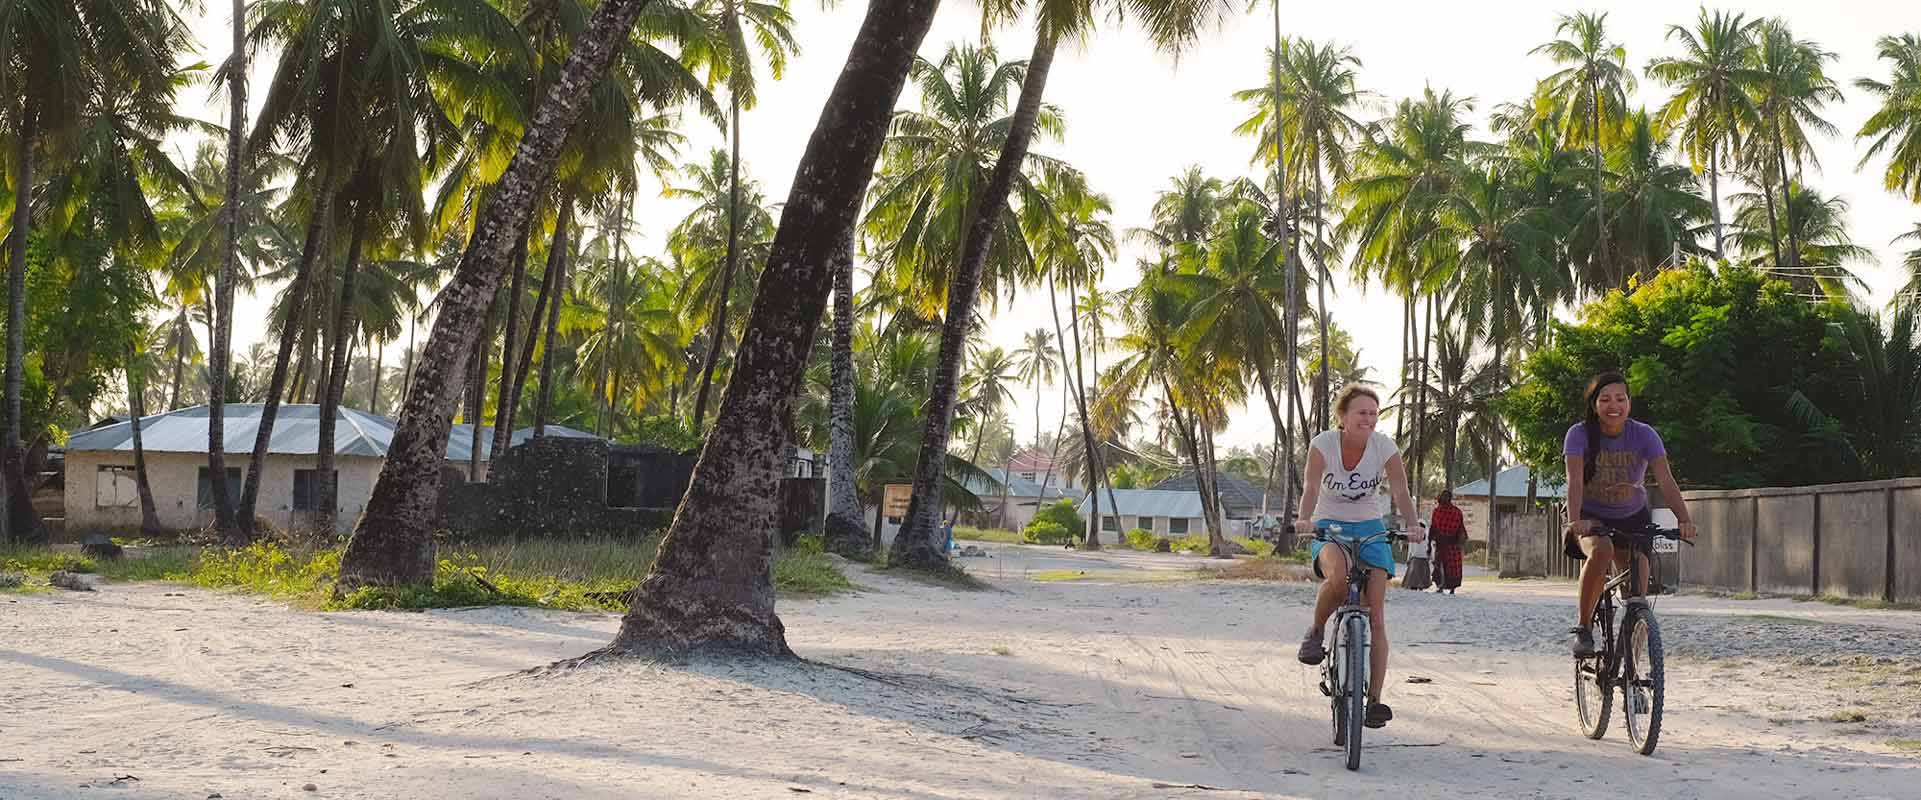 Biking through Jambiani on our7 days bicycle holiday all around Zanzibar